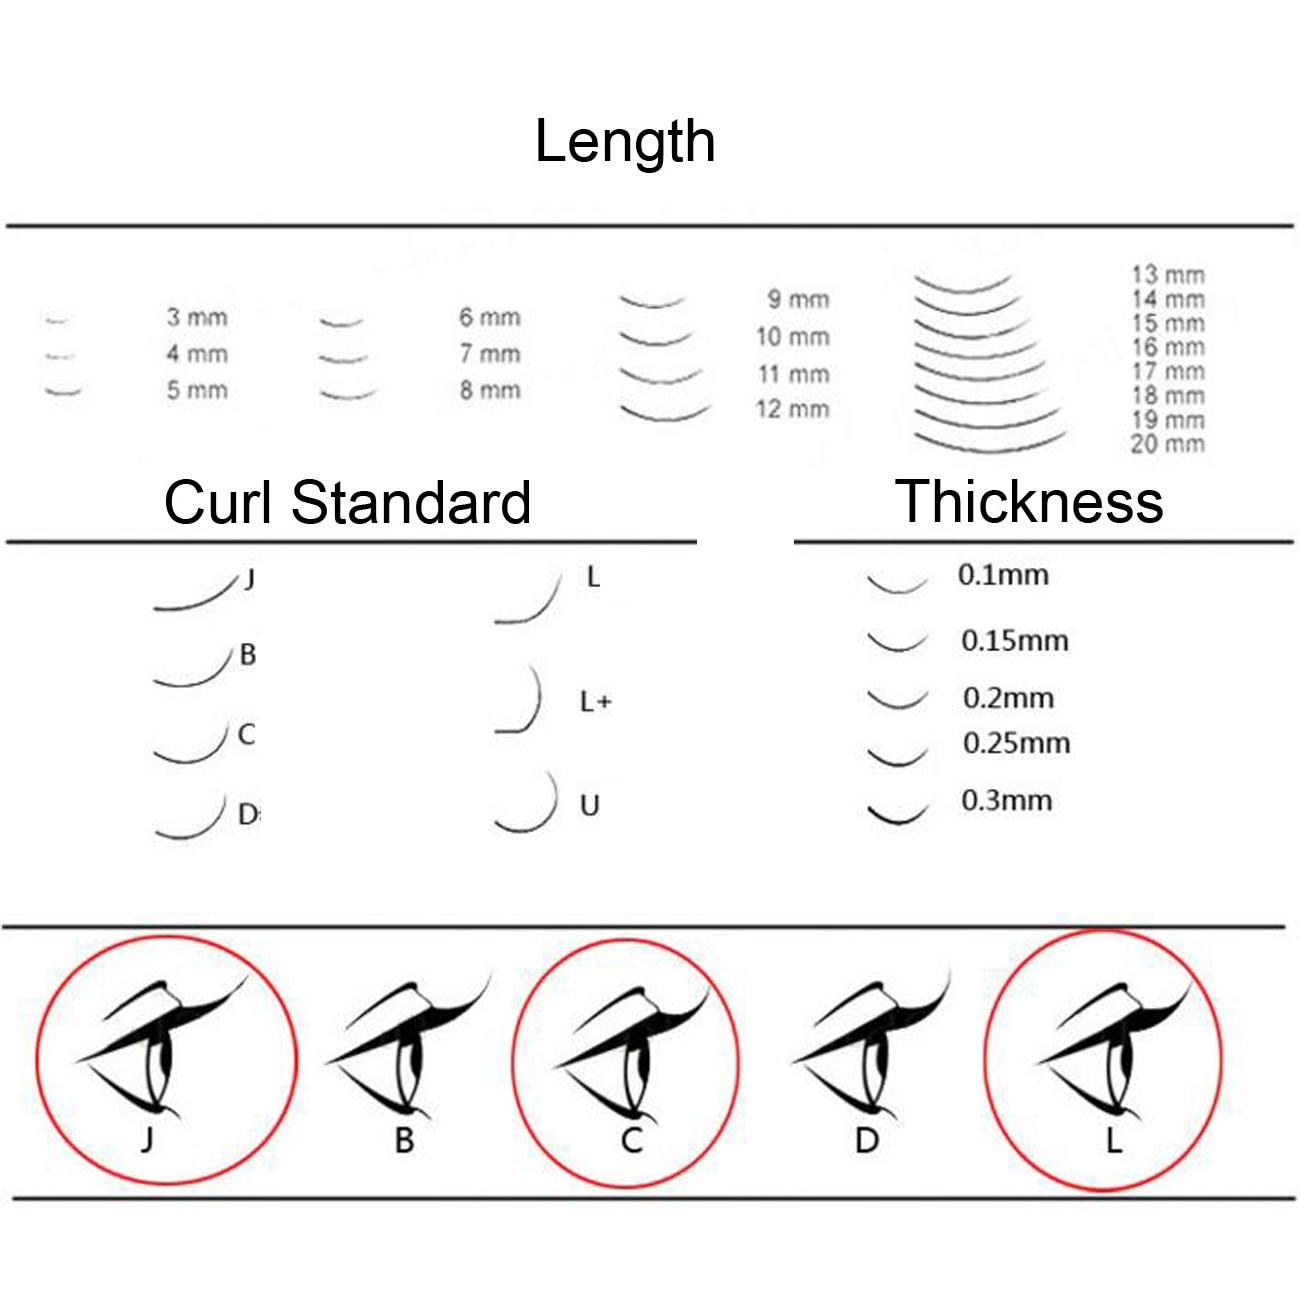 Blink Make up False Eyelash Mixed Length J/C/B/D Curl 0.10/0.15/0.20/0.25mm Thick For Eyelash Extension Individual Mink Eyelash